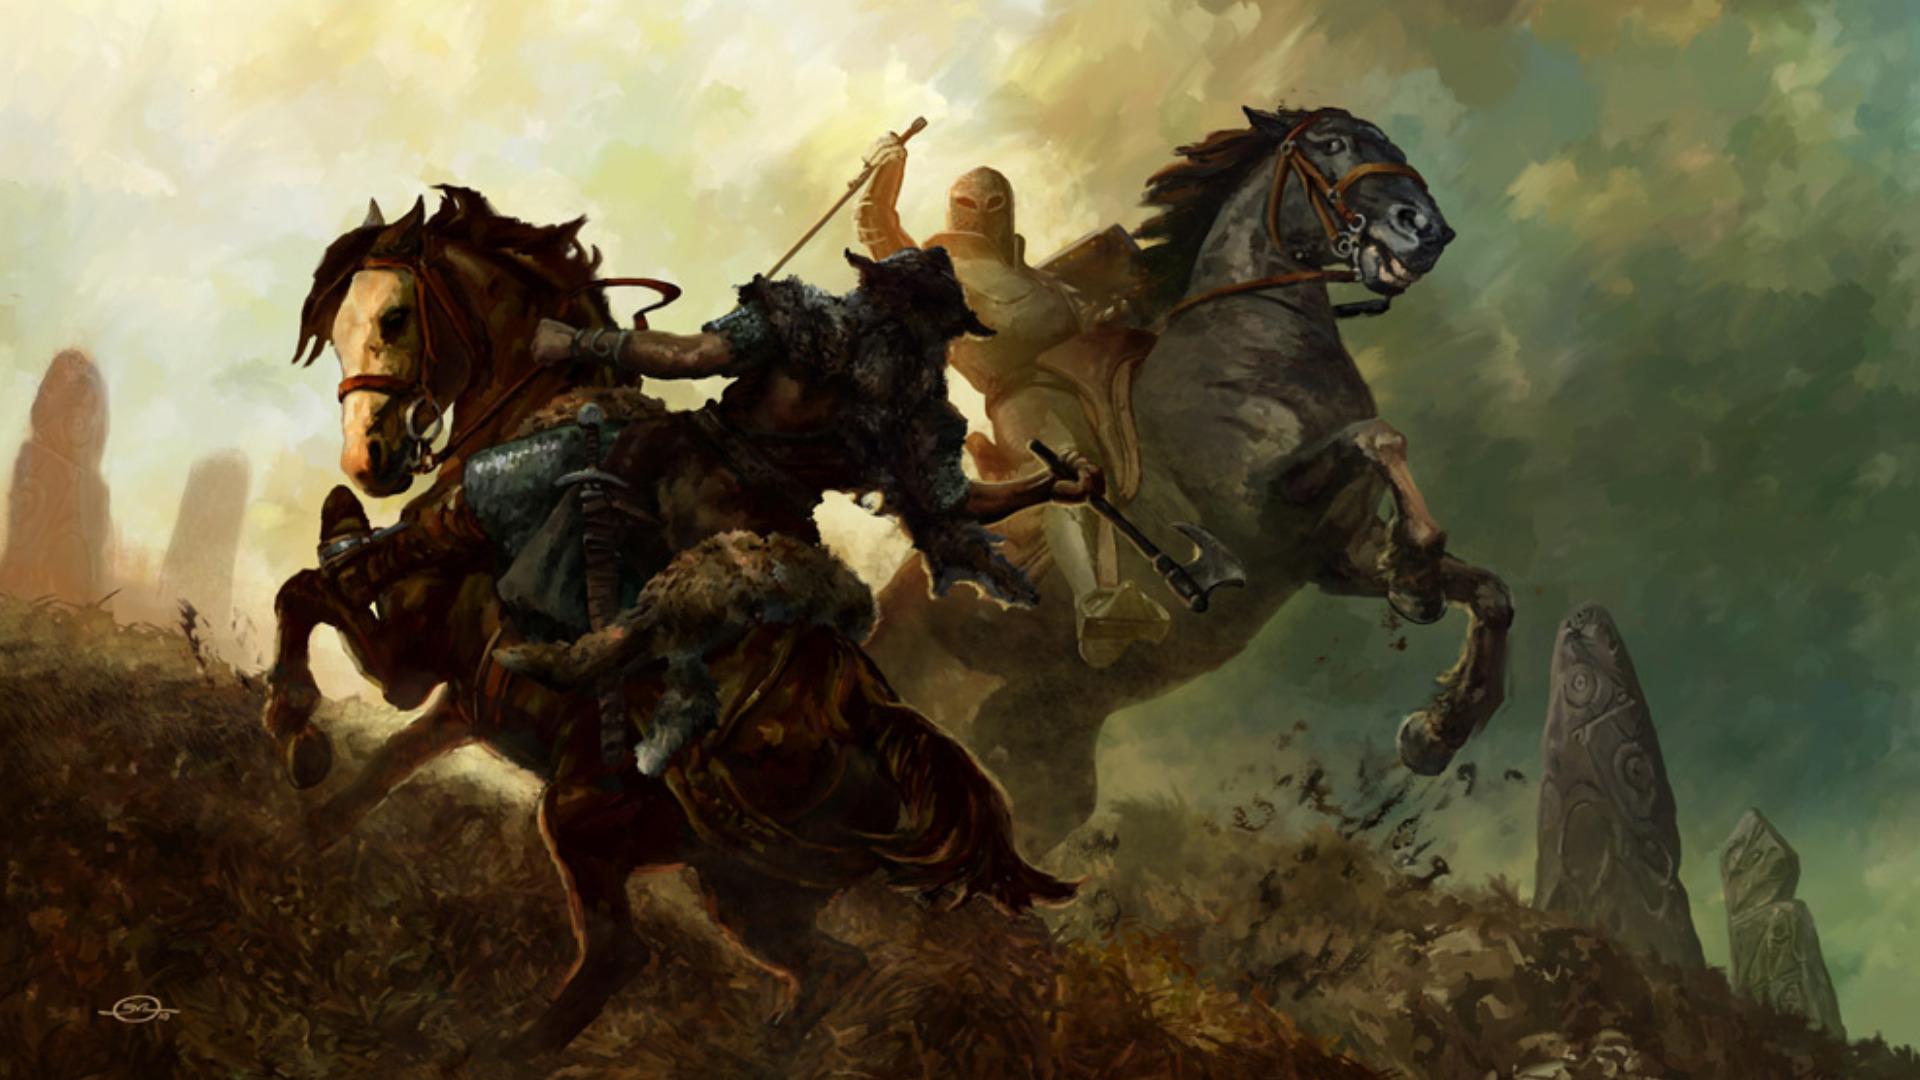 Fantasy Battle Wallpaper 1920x1080